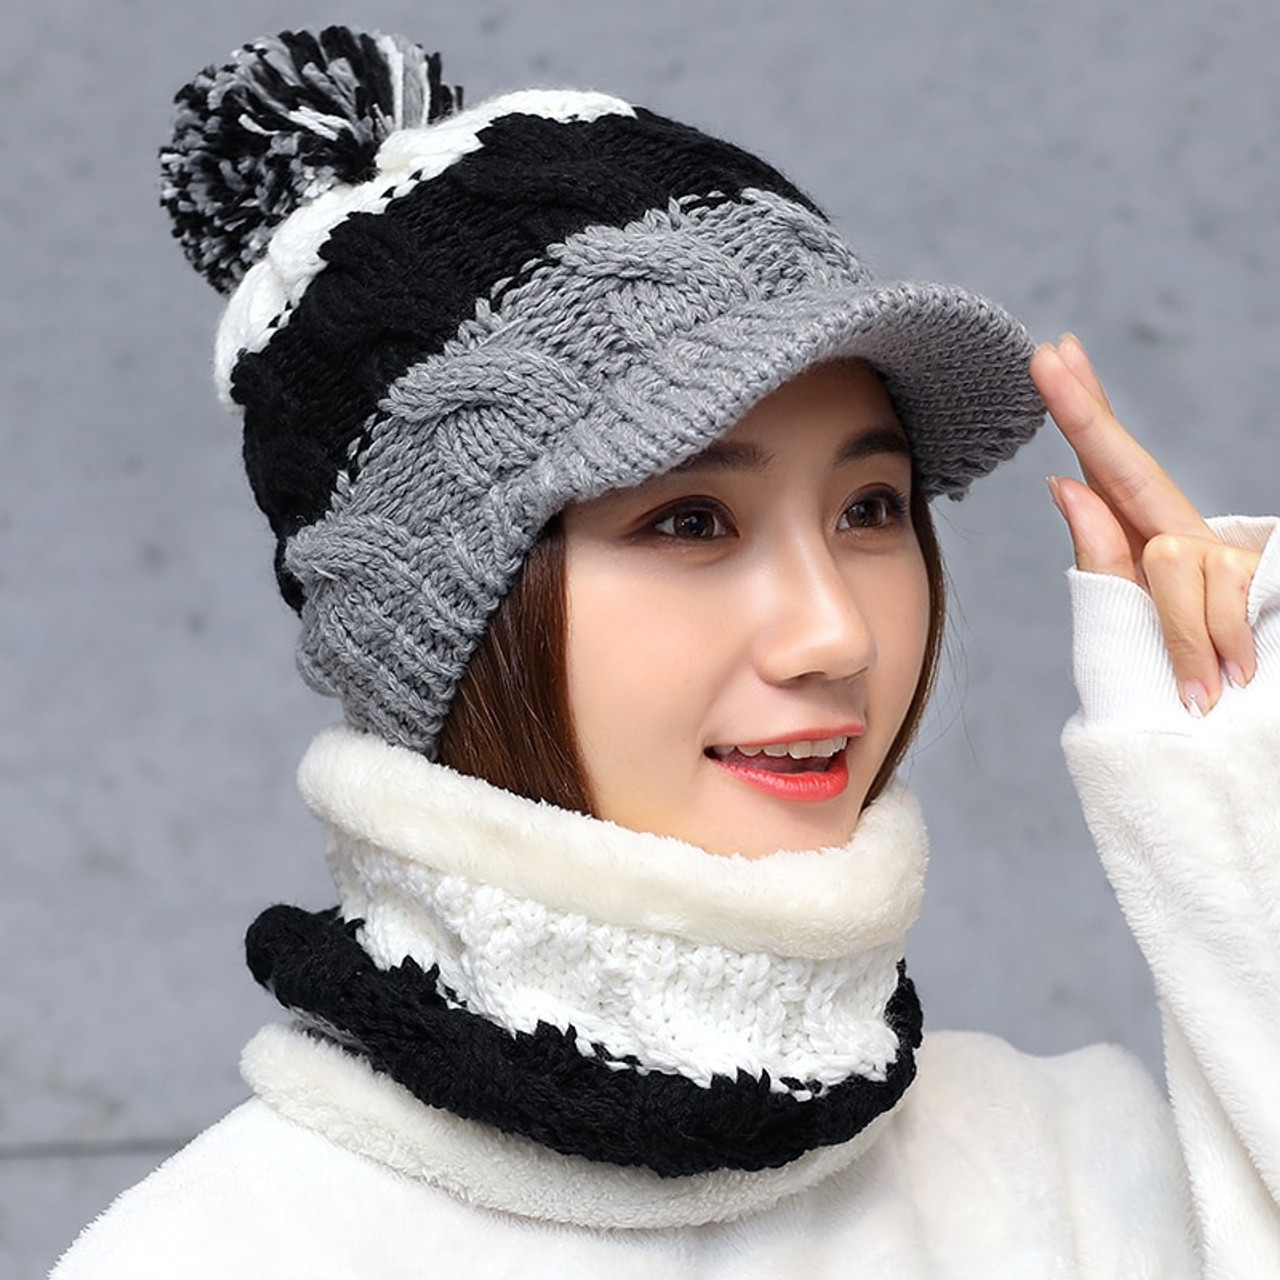 f3272aa6e94 Balaclava Women s Knitted Hat Scarf Caps Neck Warmer Winter Hats For Men  Women Skullies Beanies Warm ...